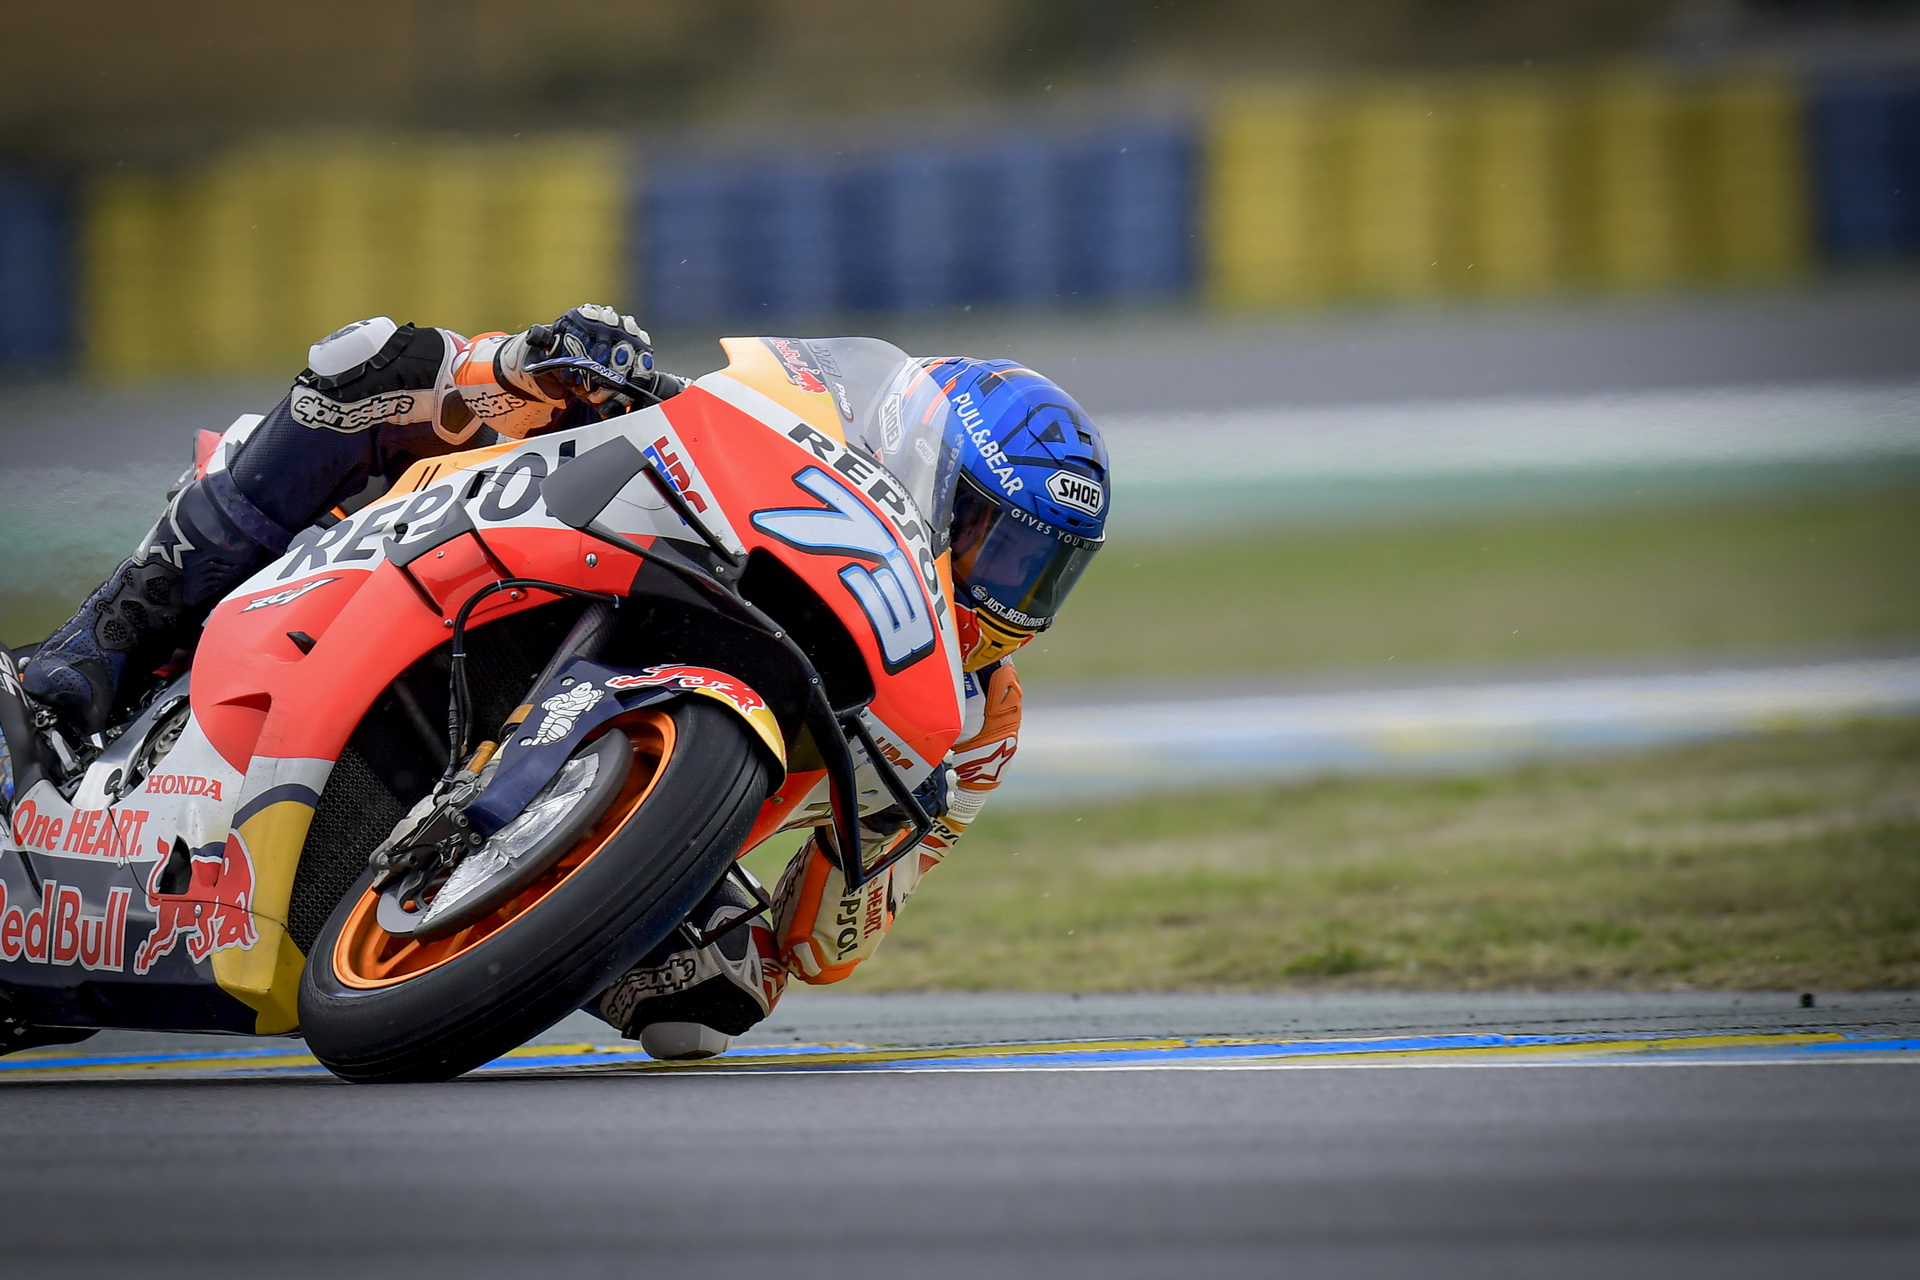 Programa #75 – Gran Premio Shark Helmets de Francia de MotoGP